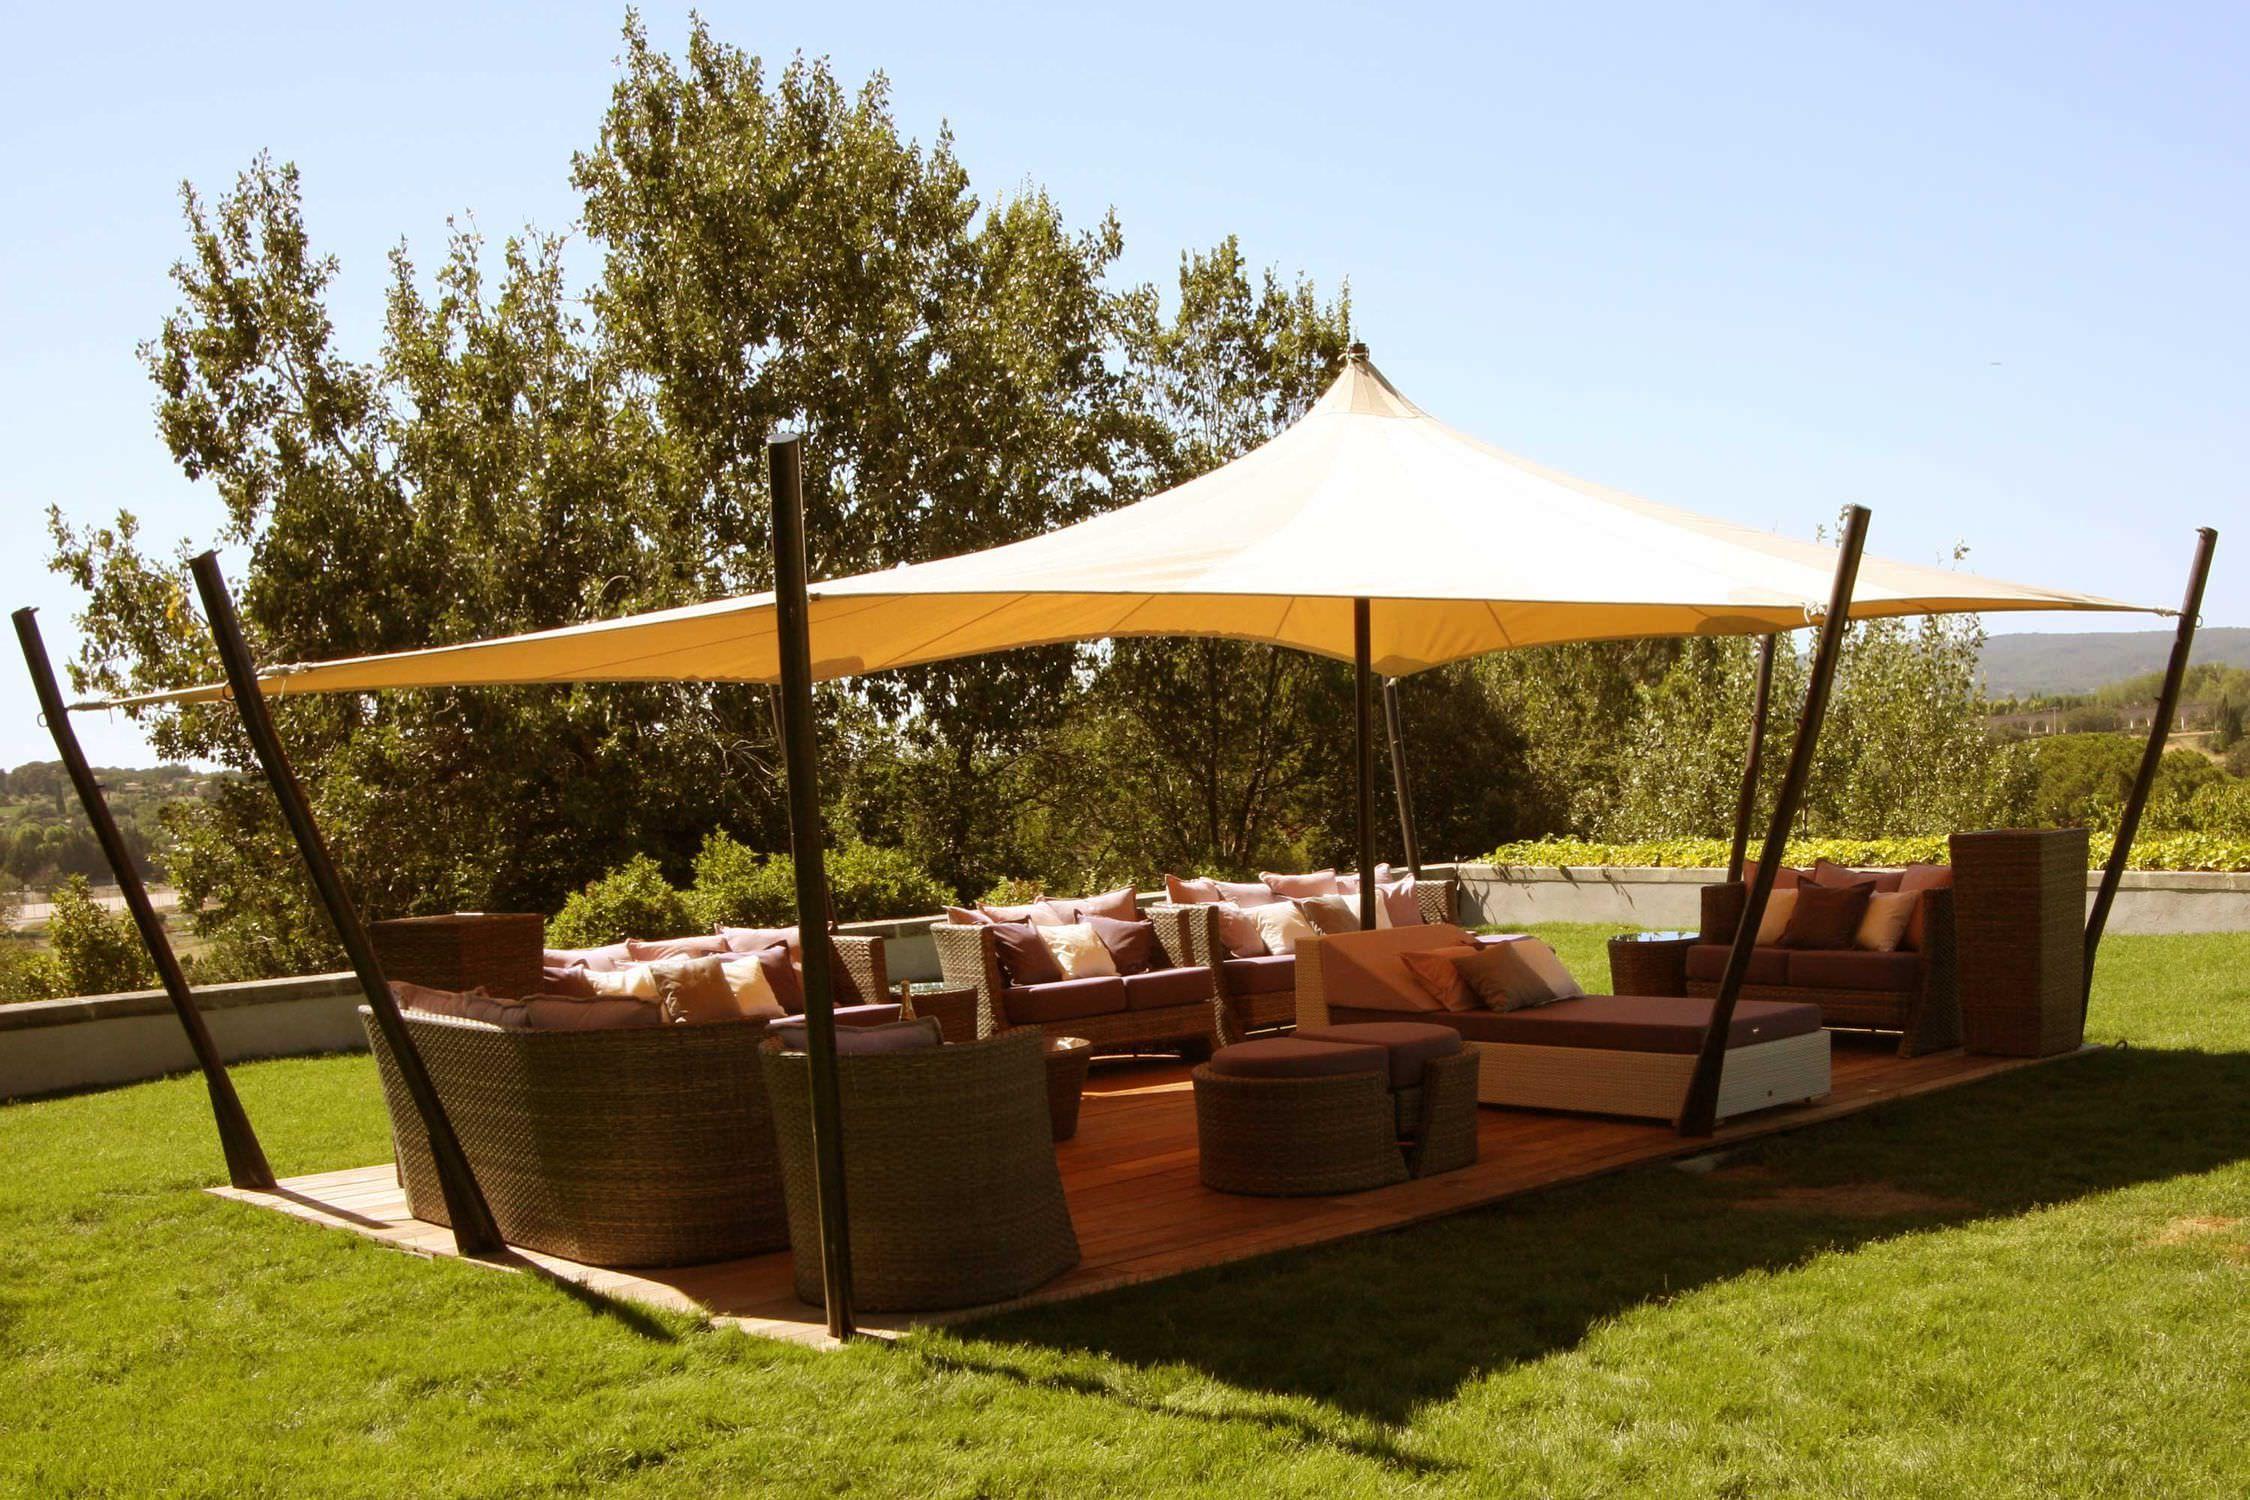 holz pavillon stoffdach tente touareg jardin aixois. Black Bedroom Furniture Sets. Home Design Ideas